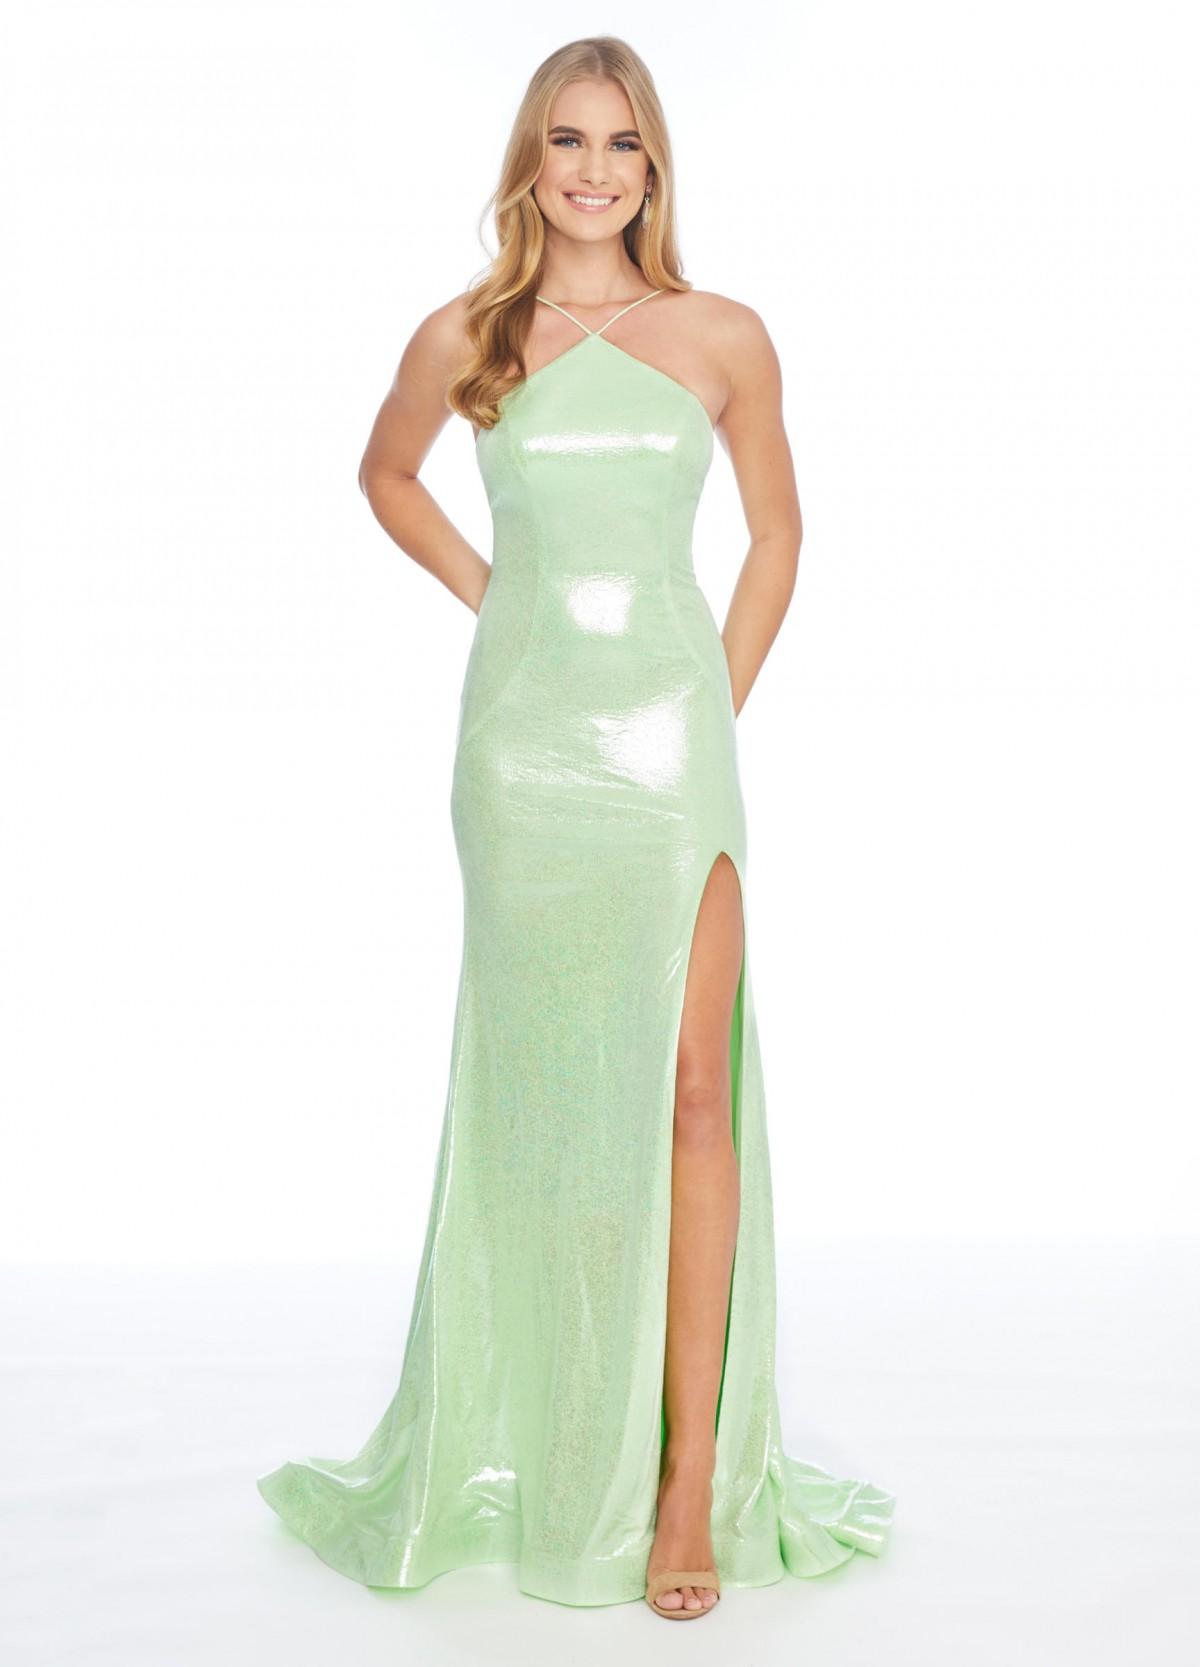 Ashley Lauren Metallic Jersey Gown 1862 (#13 on auction)